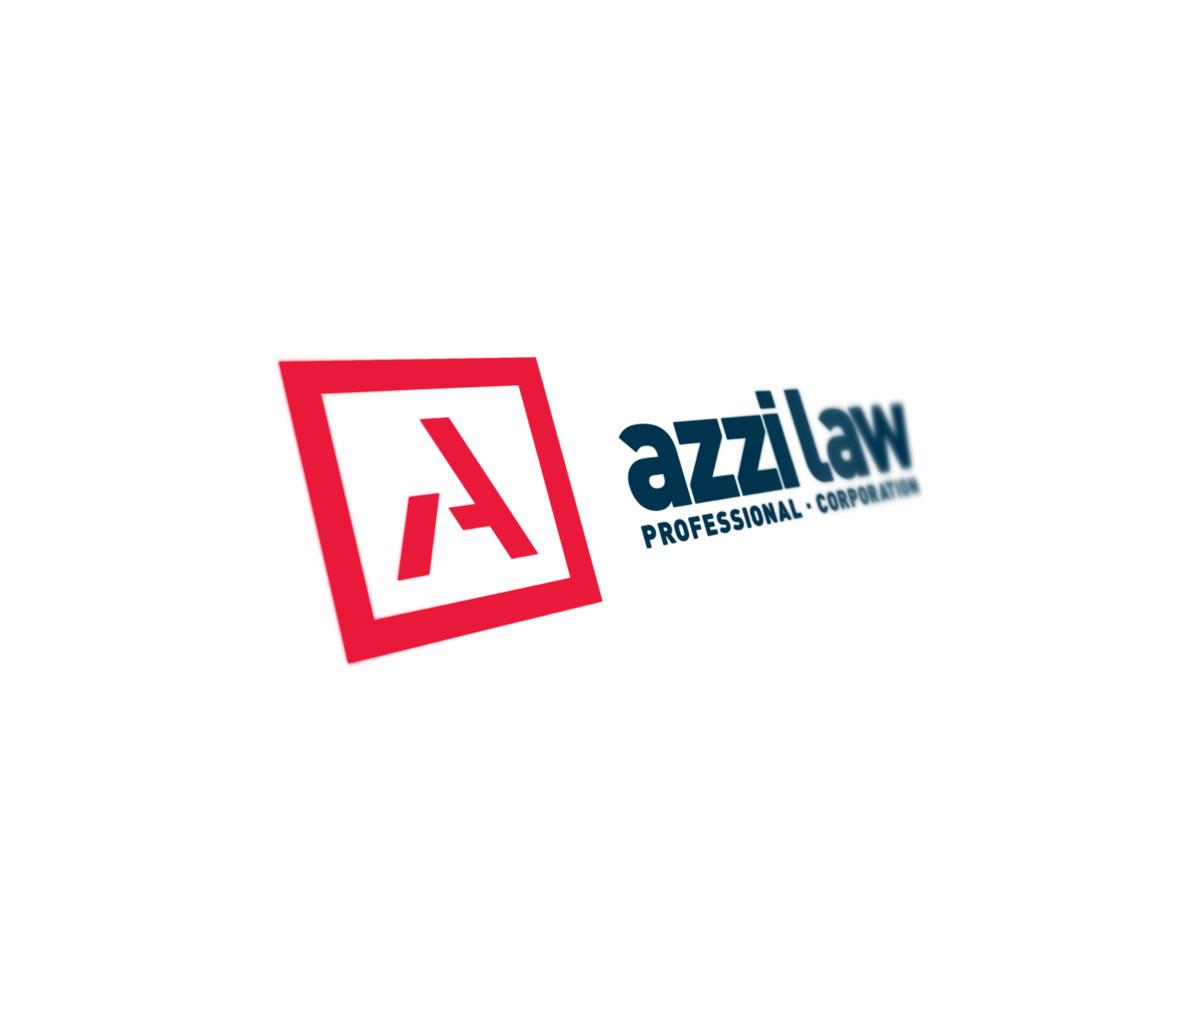 law law firm ottawa Canada design brand graphics